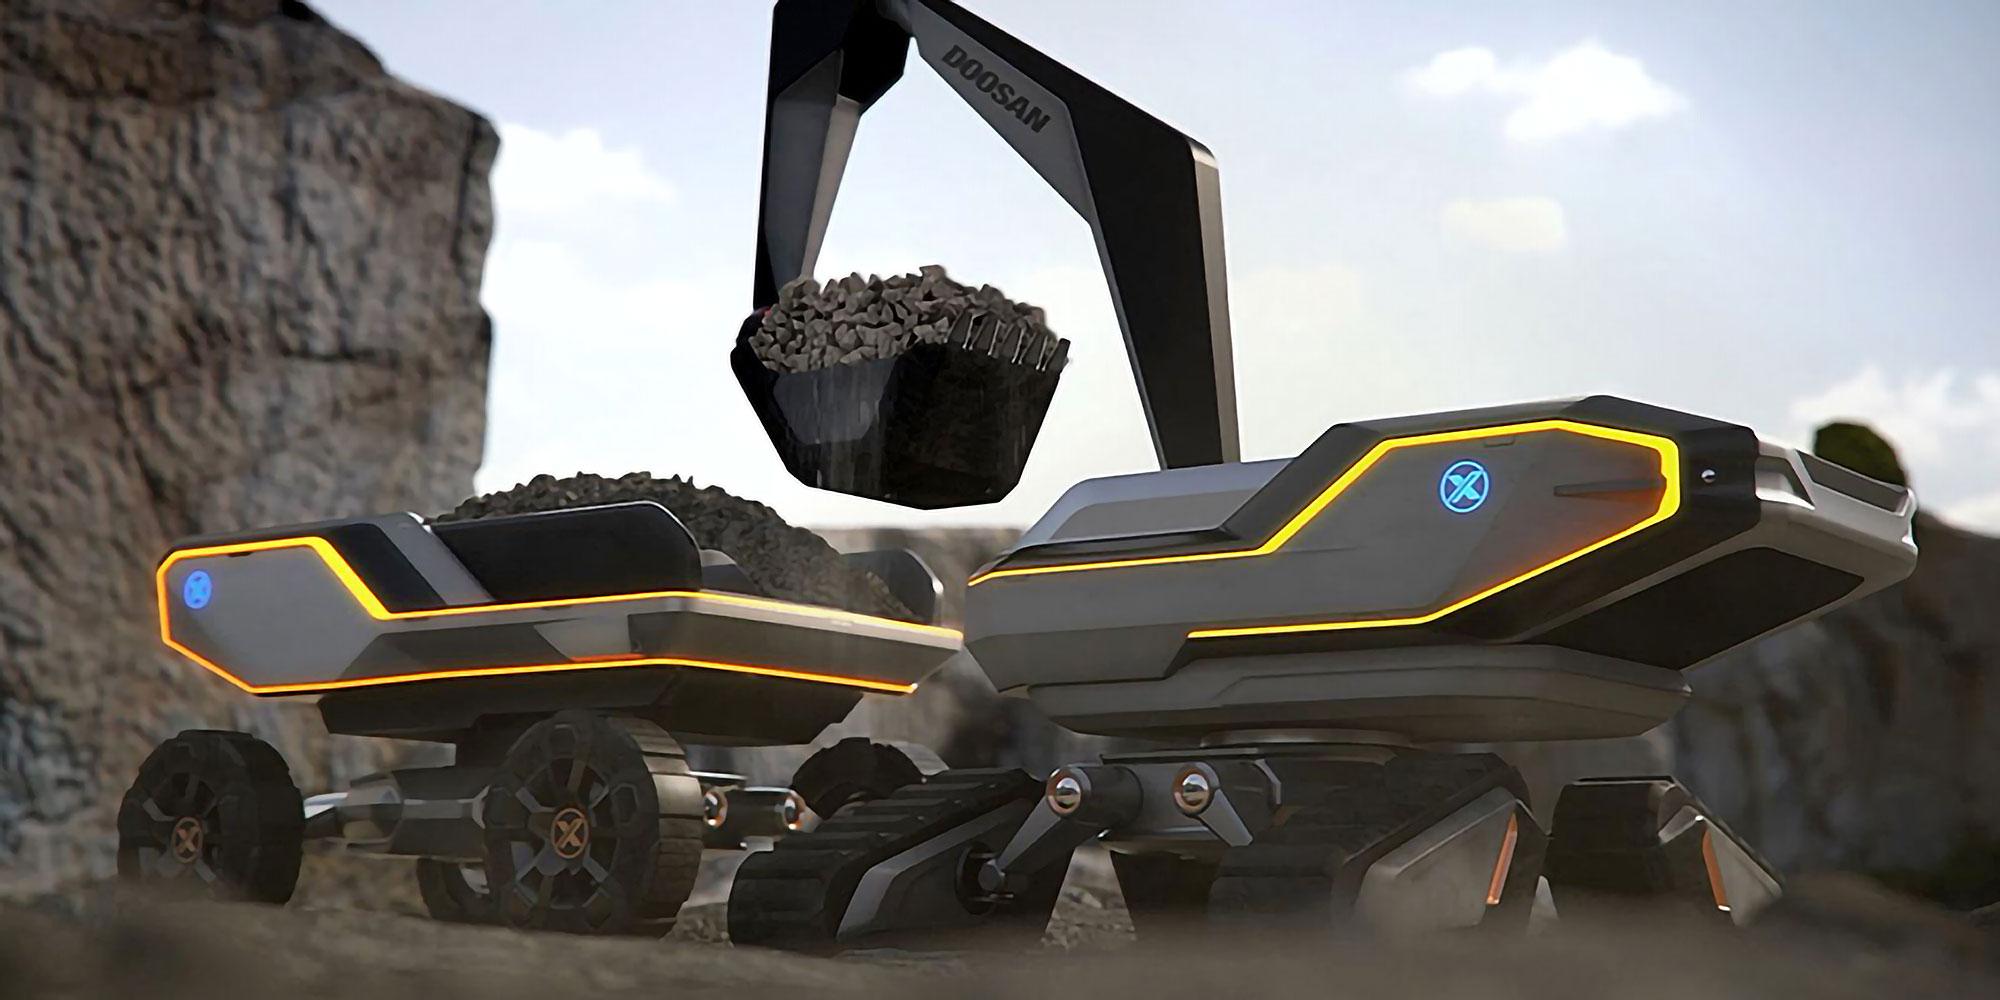 Concept-X System by Doosan Infracore